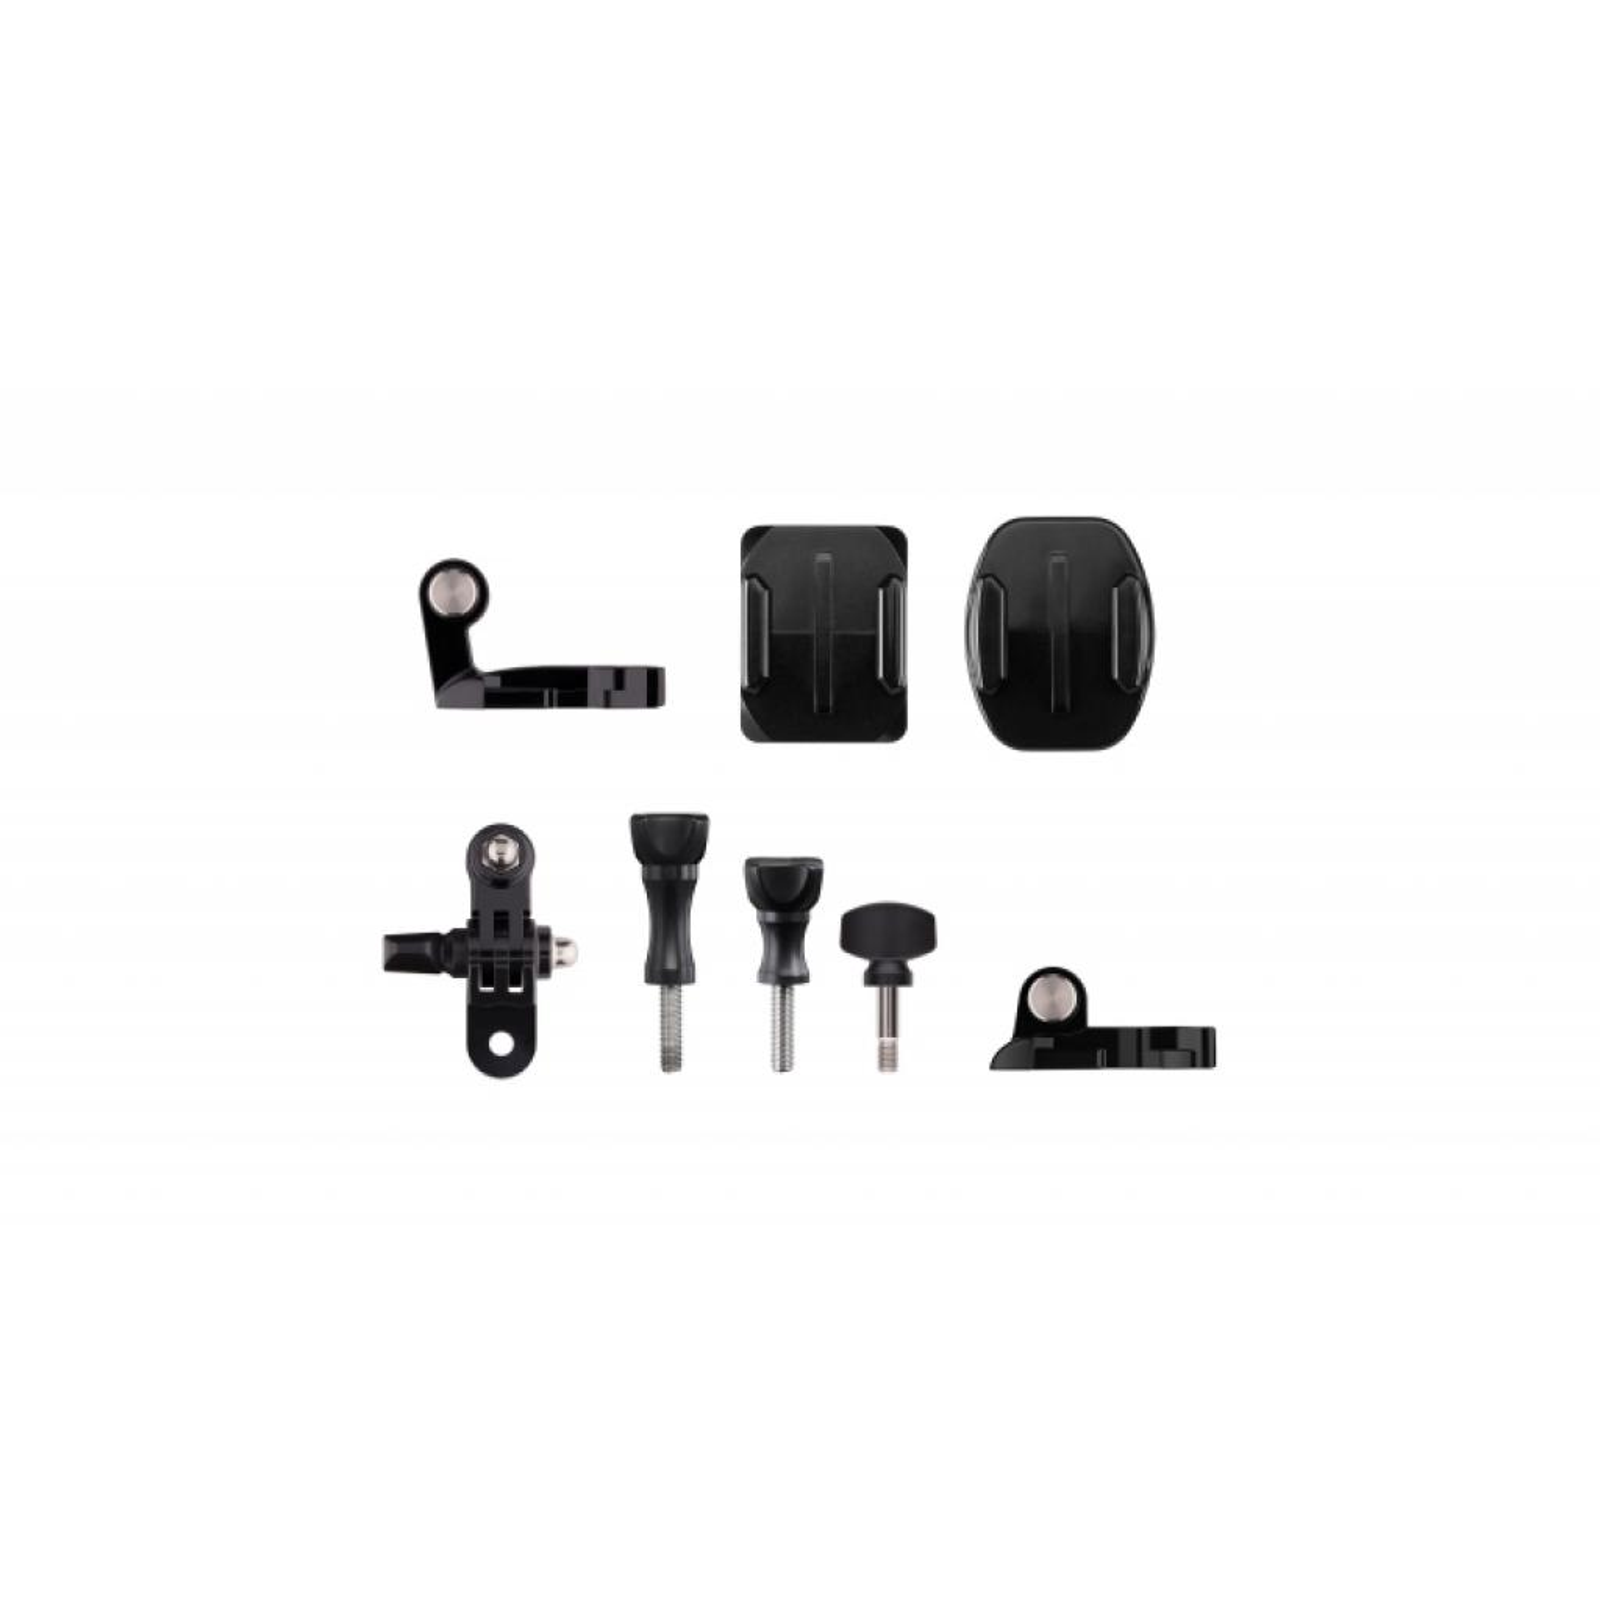 Аксессуар к экшн-камерам GoPro Grab Bag Replacements Parts (AGBAG-002)